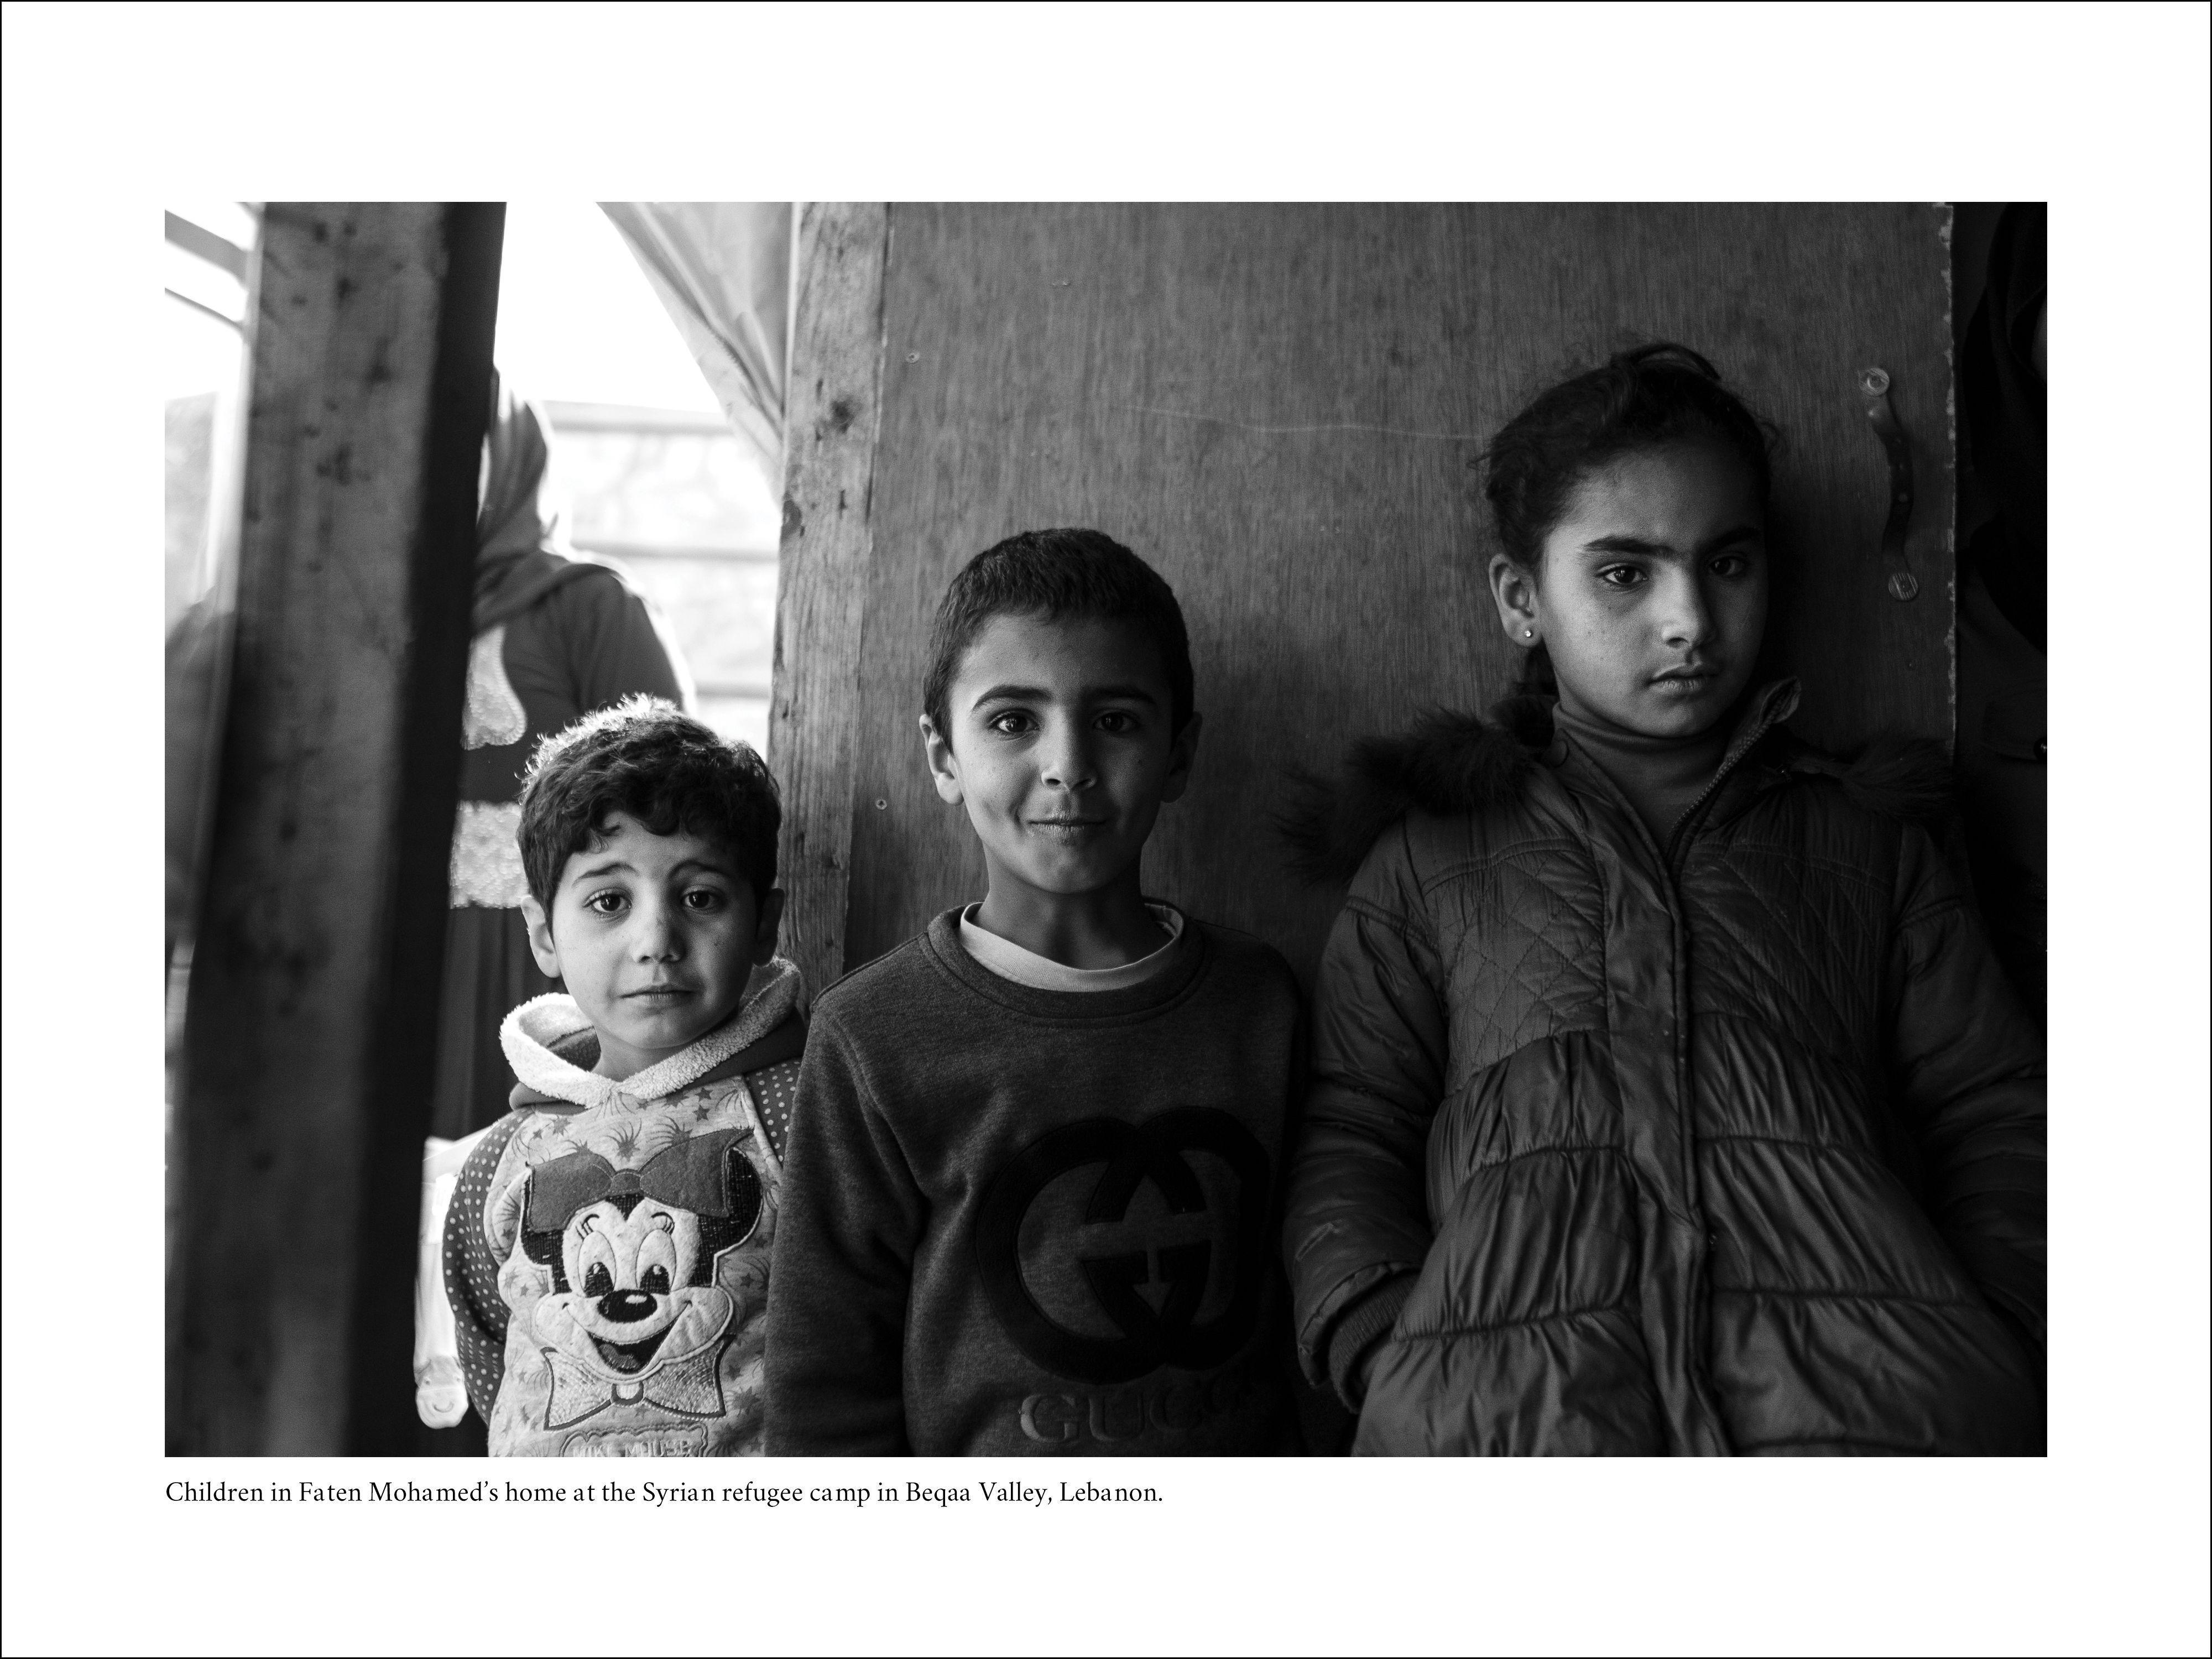 Eleonora Sabet portrait fotografia photography reportage